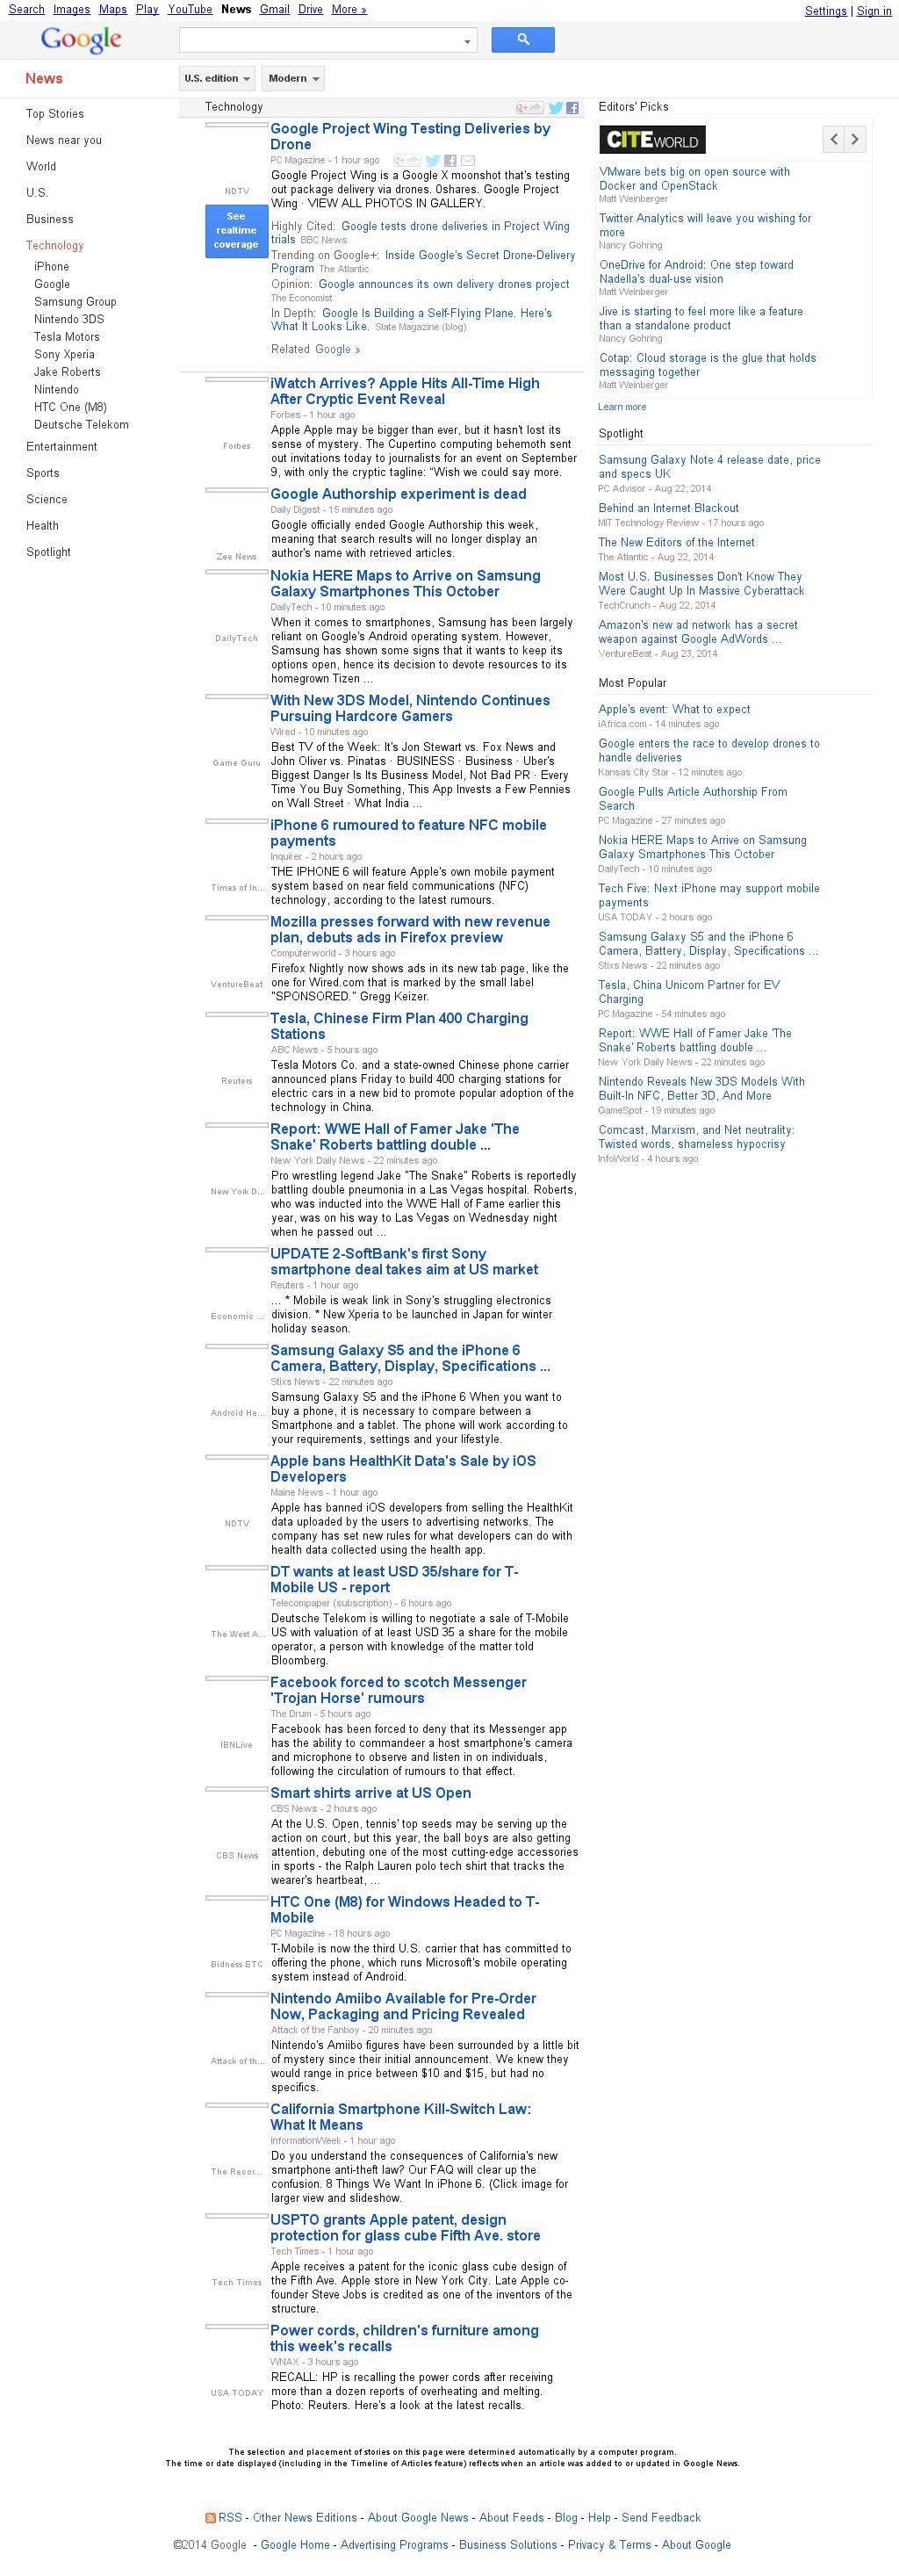 Google News: Technology at Friday Aug. 29, 2014, 3:06 p.m. UTC